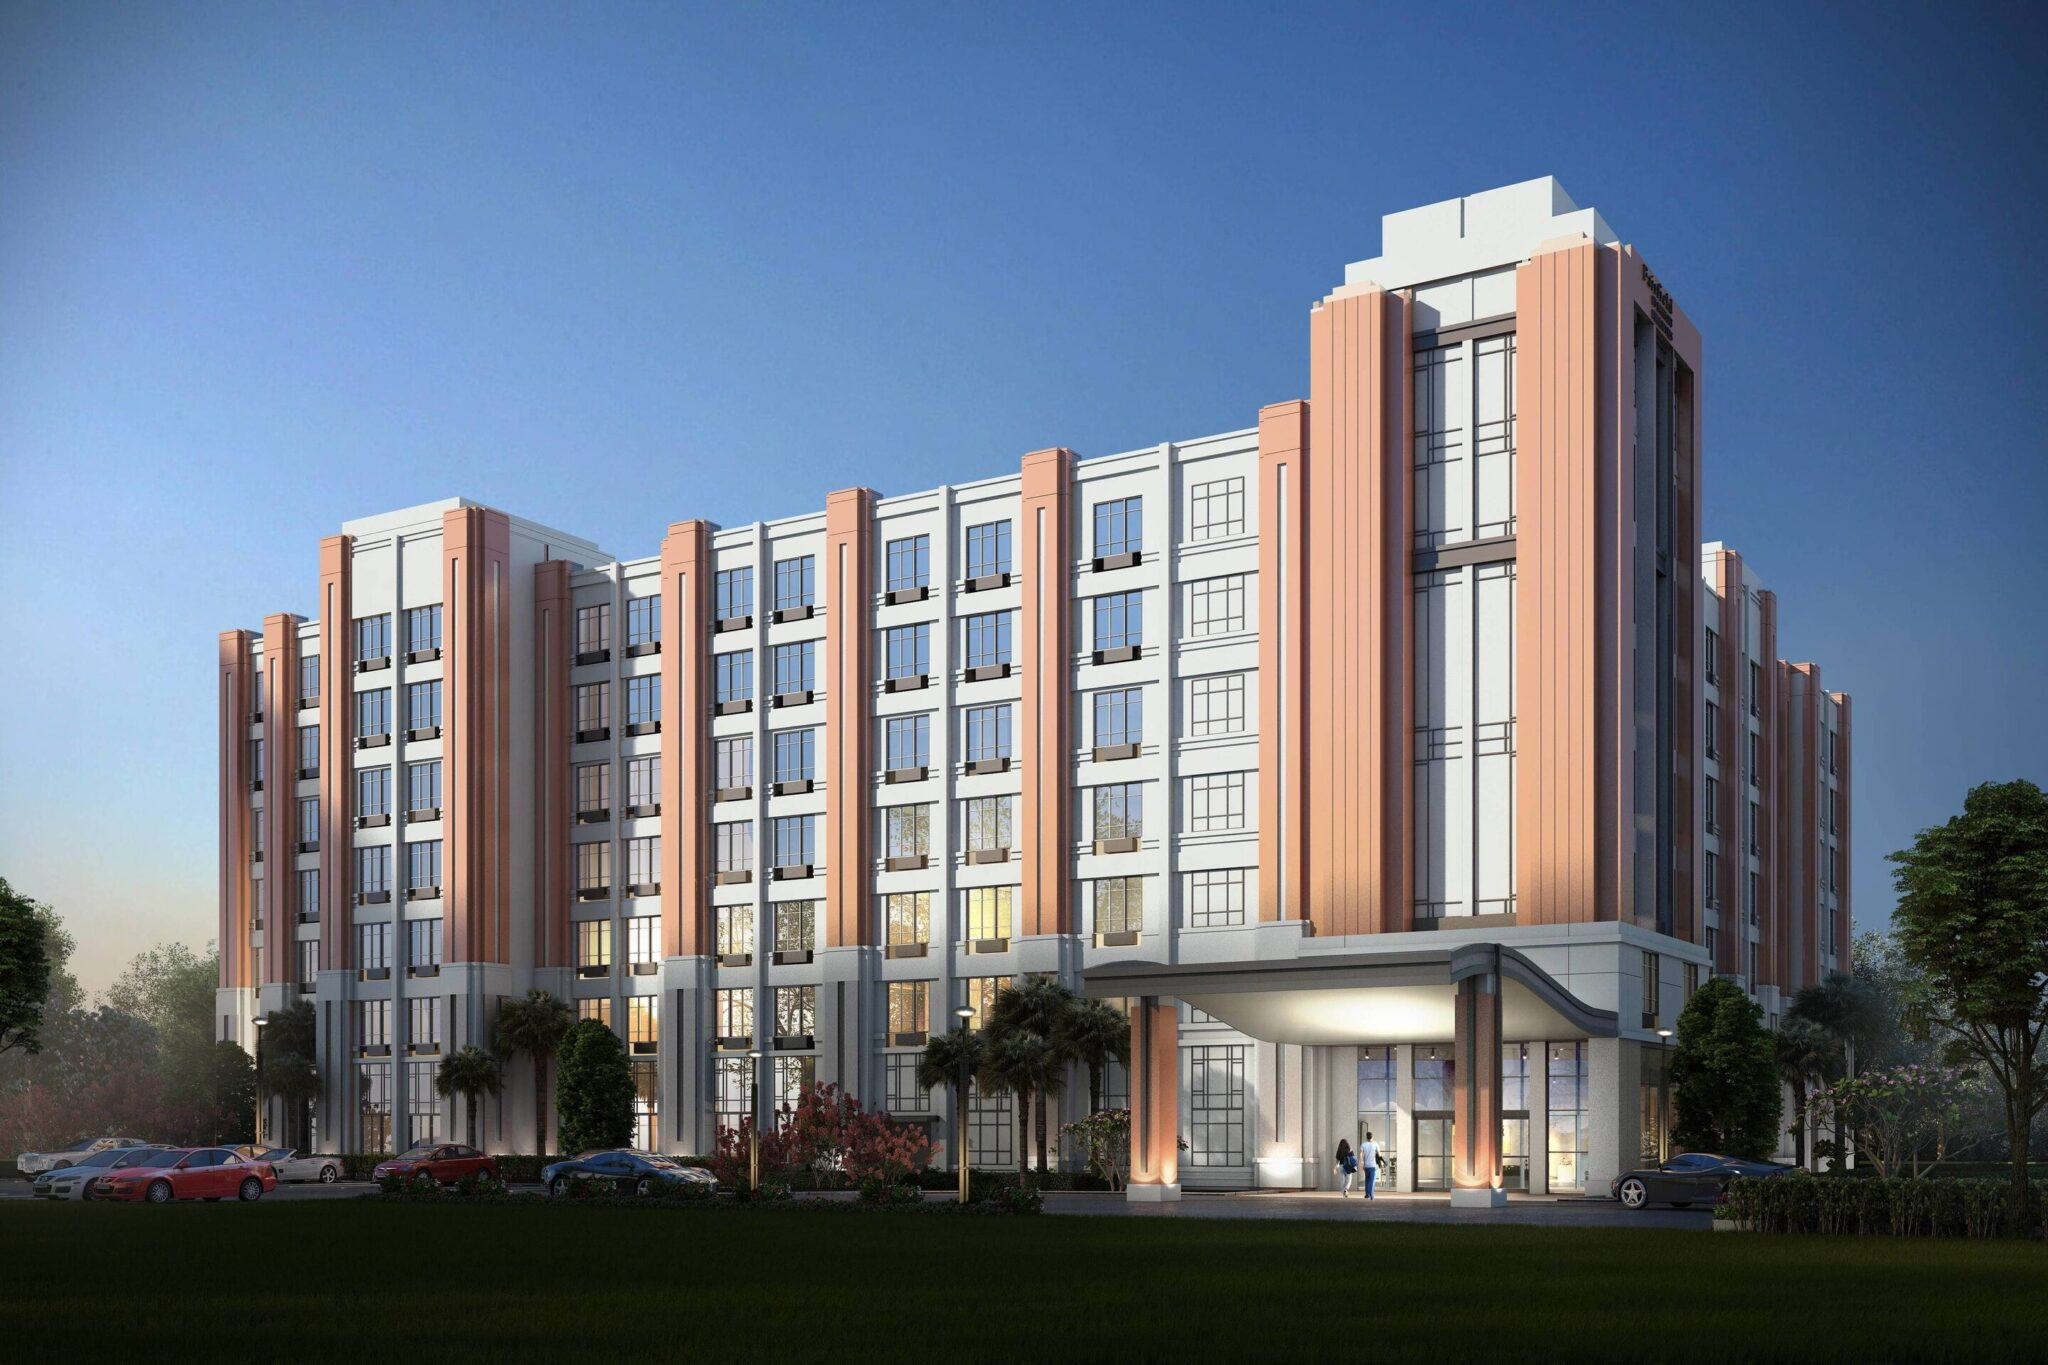 Fairfield Inn & Suites at Flamingo Crossings Town Center